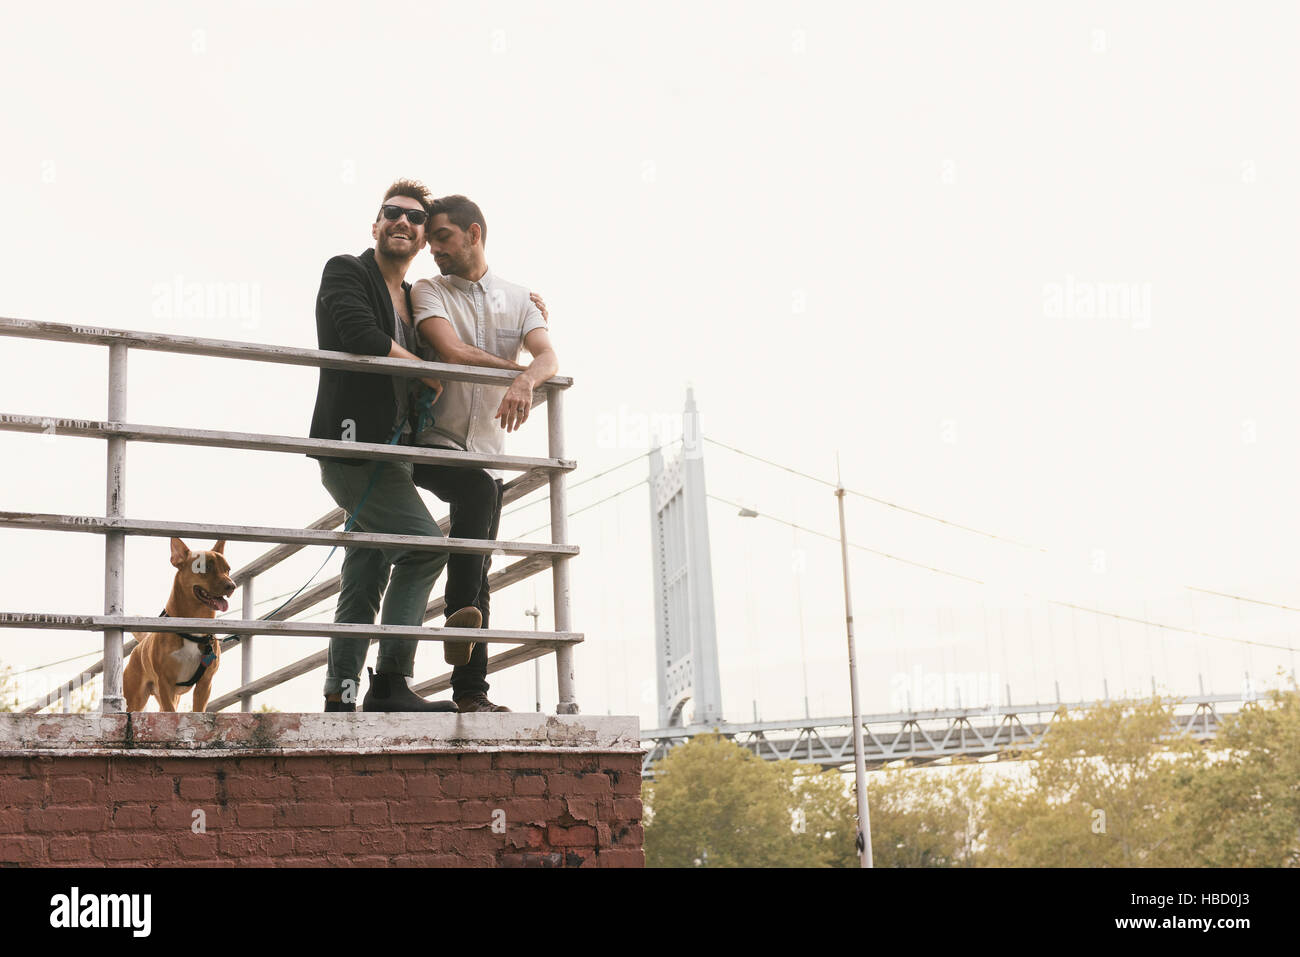 Young homme couple sur Riverside avec chien, Astoria, New York, USA Photo Stock